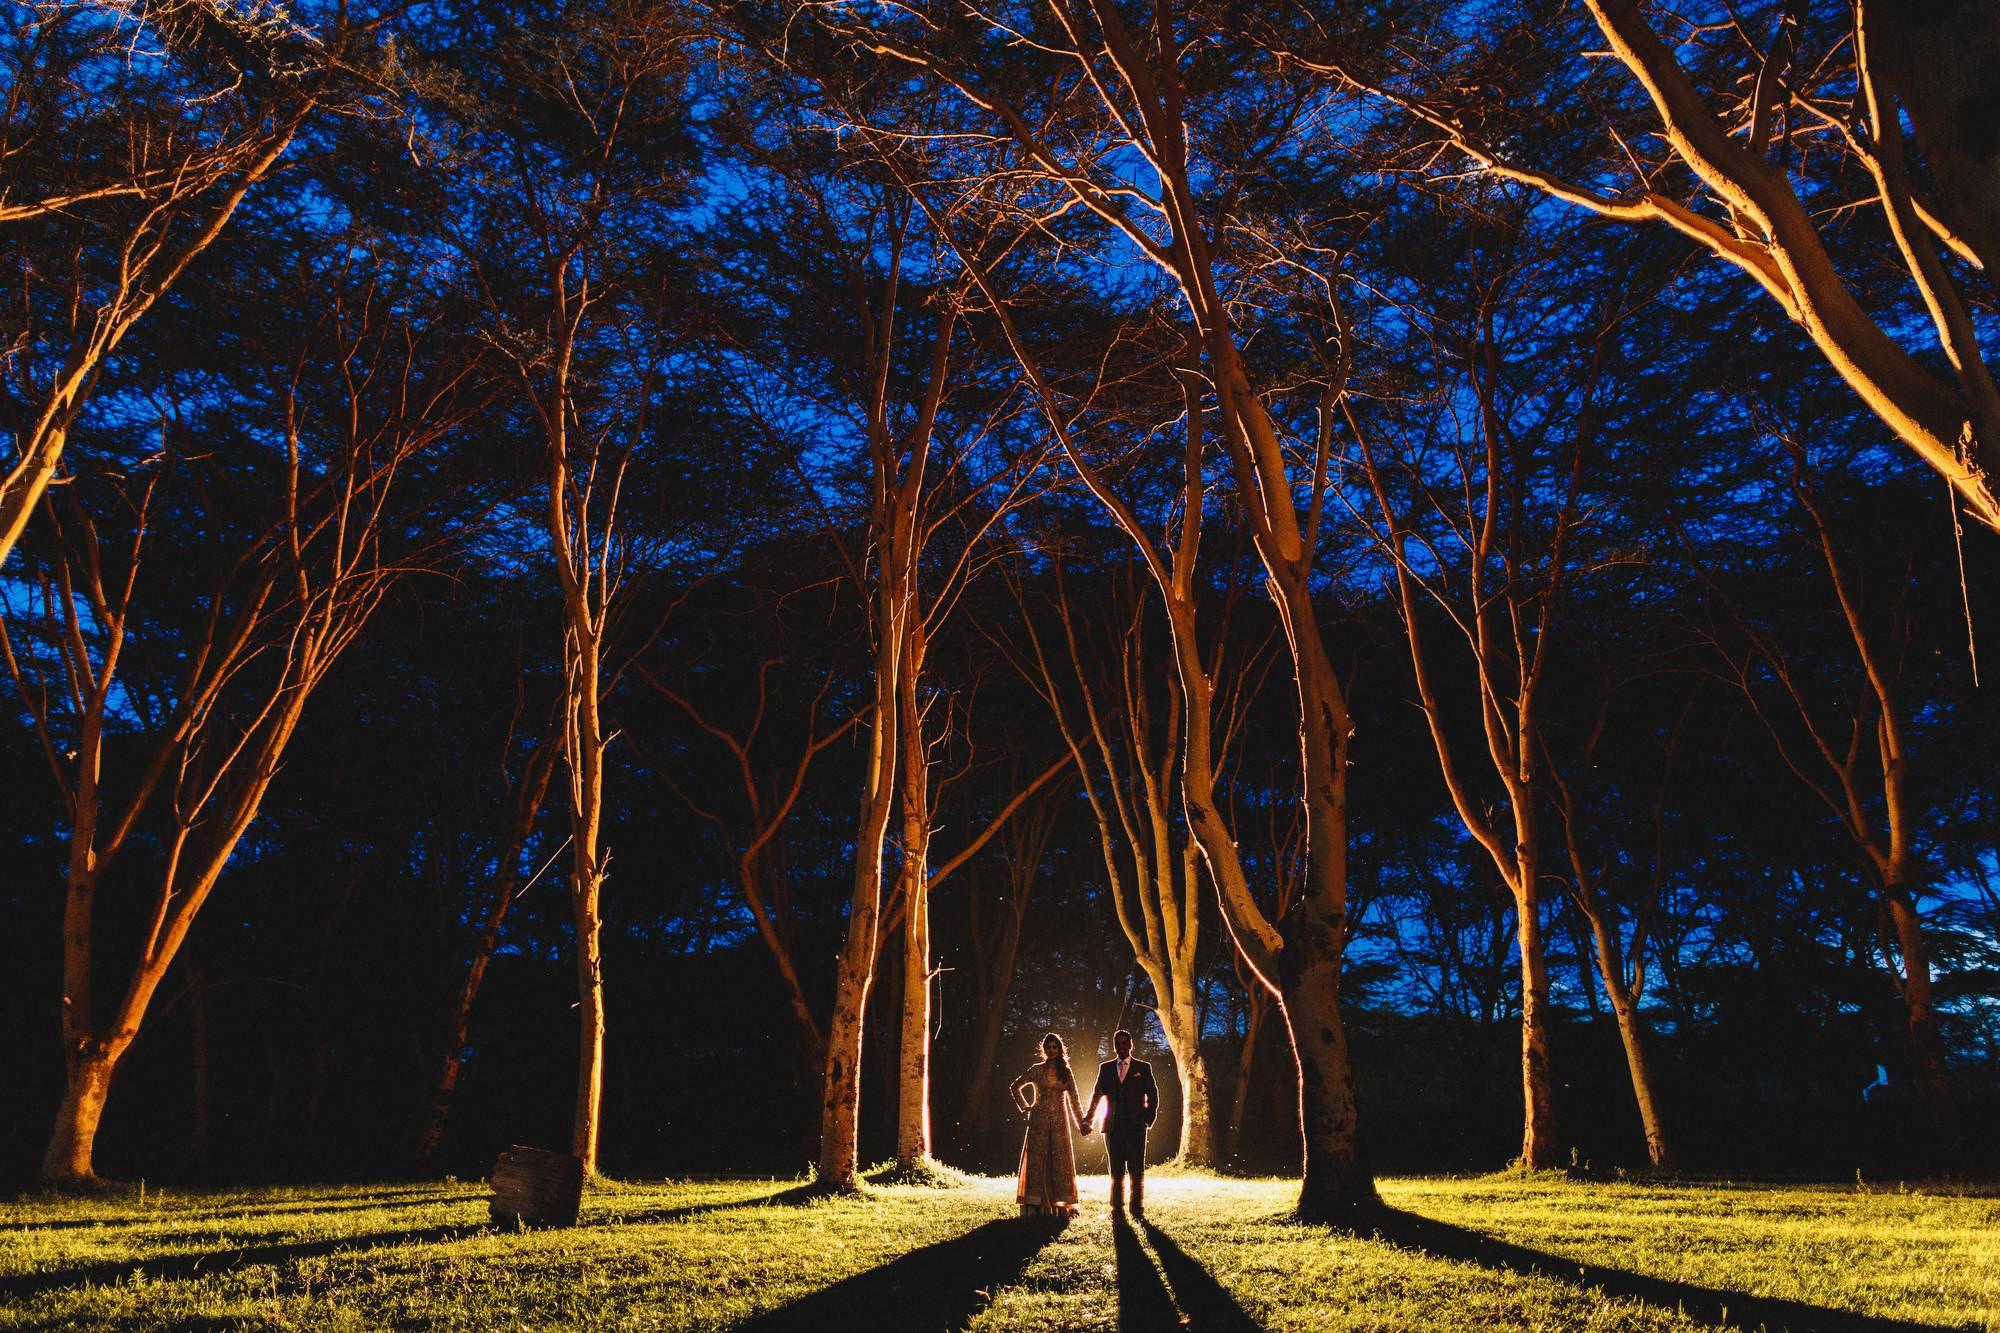 Destination wedding photography - Kenya Naivasha Enashipai